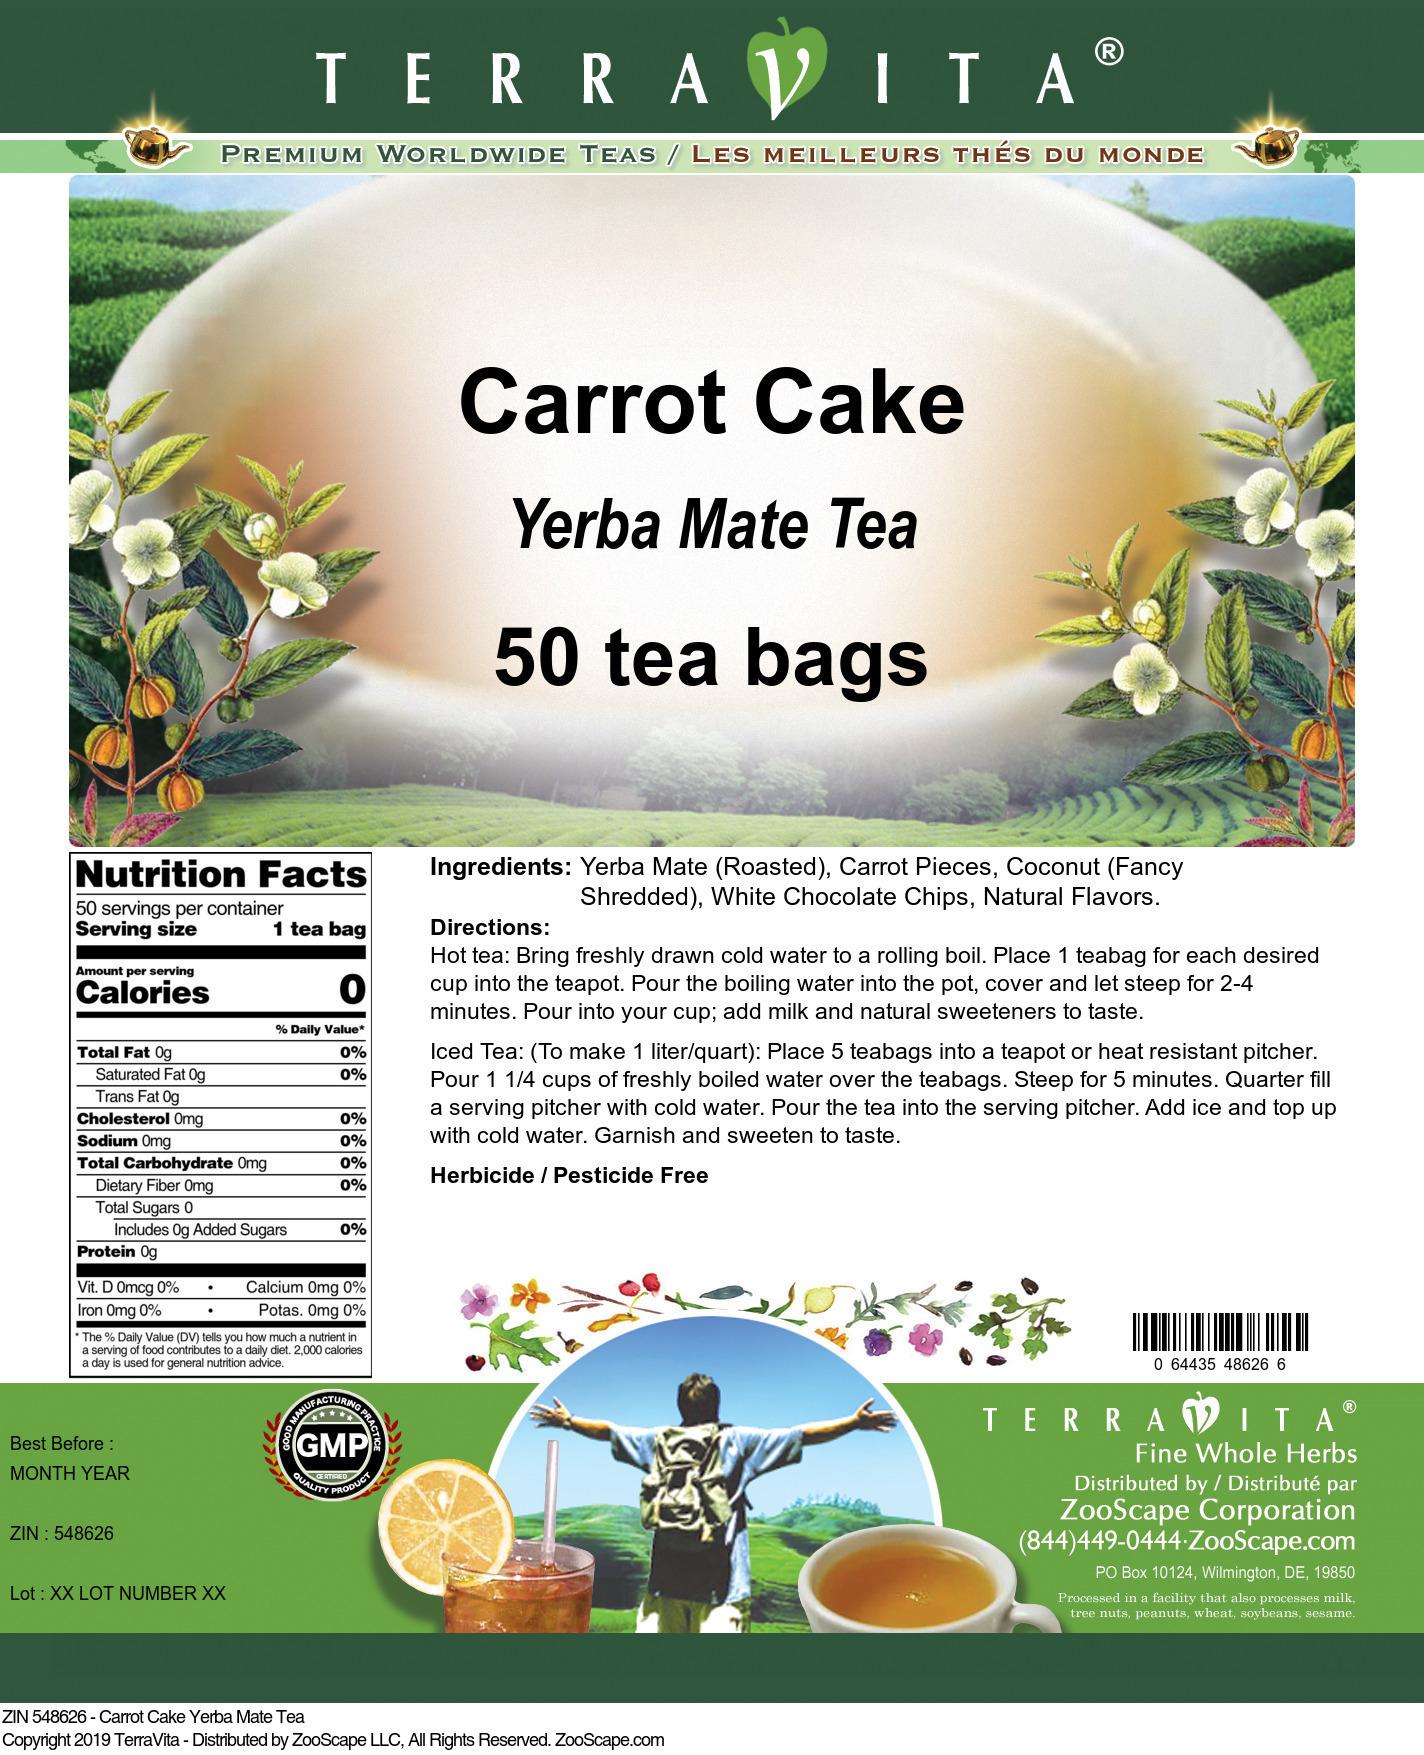 Carrot Cake Yerba Mate